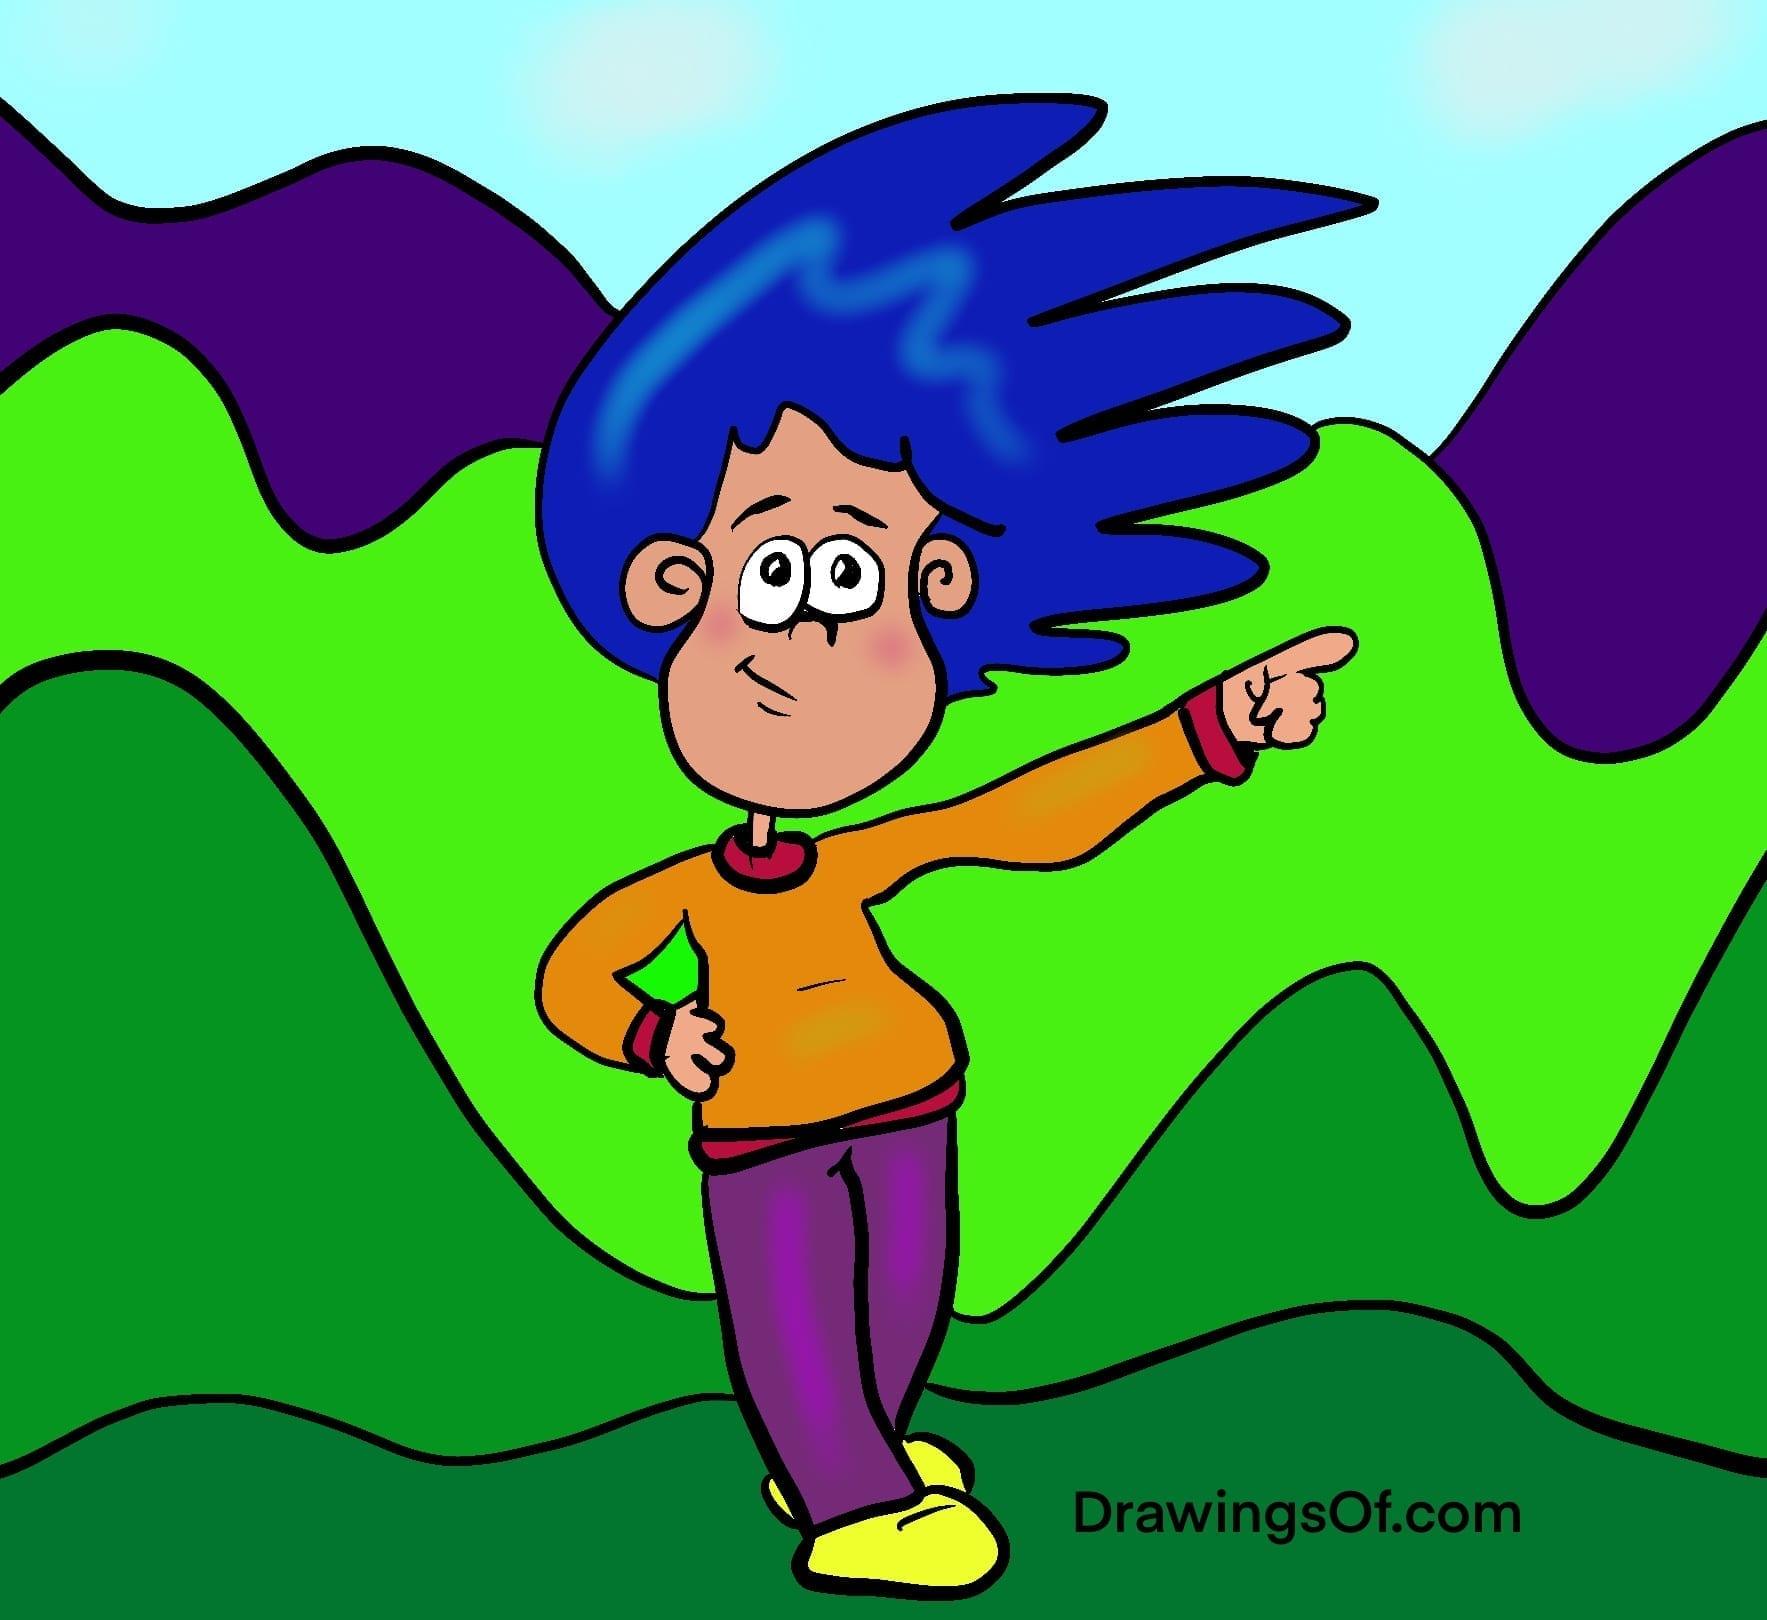 Blue hair cartoon pointing